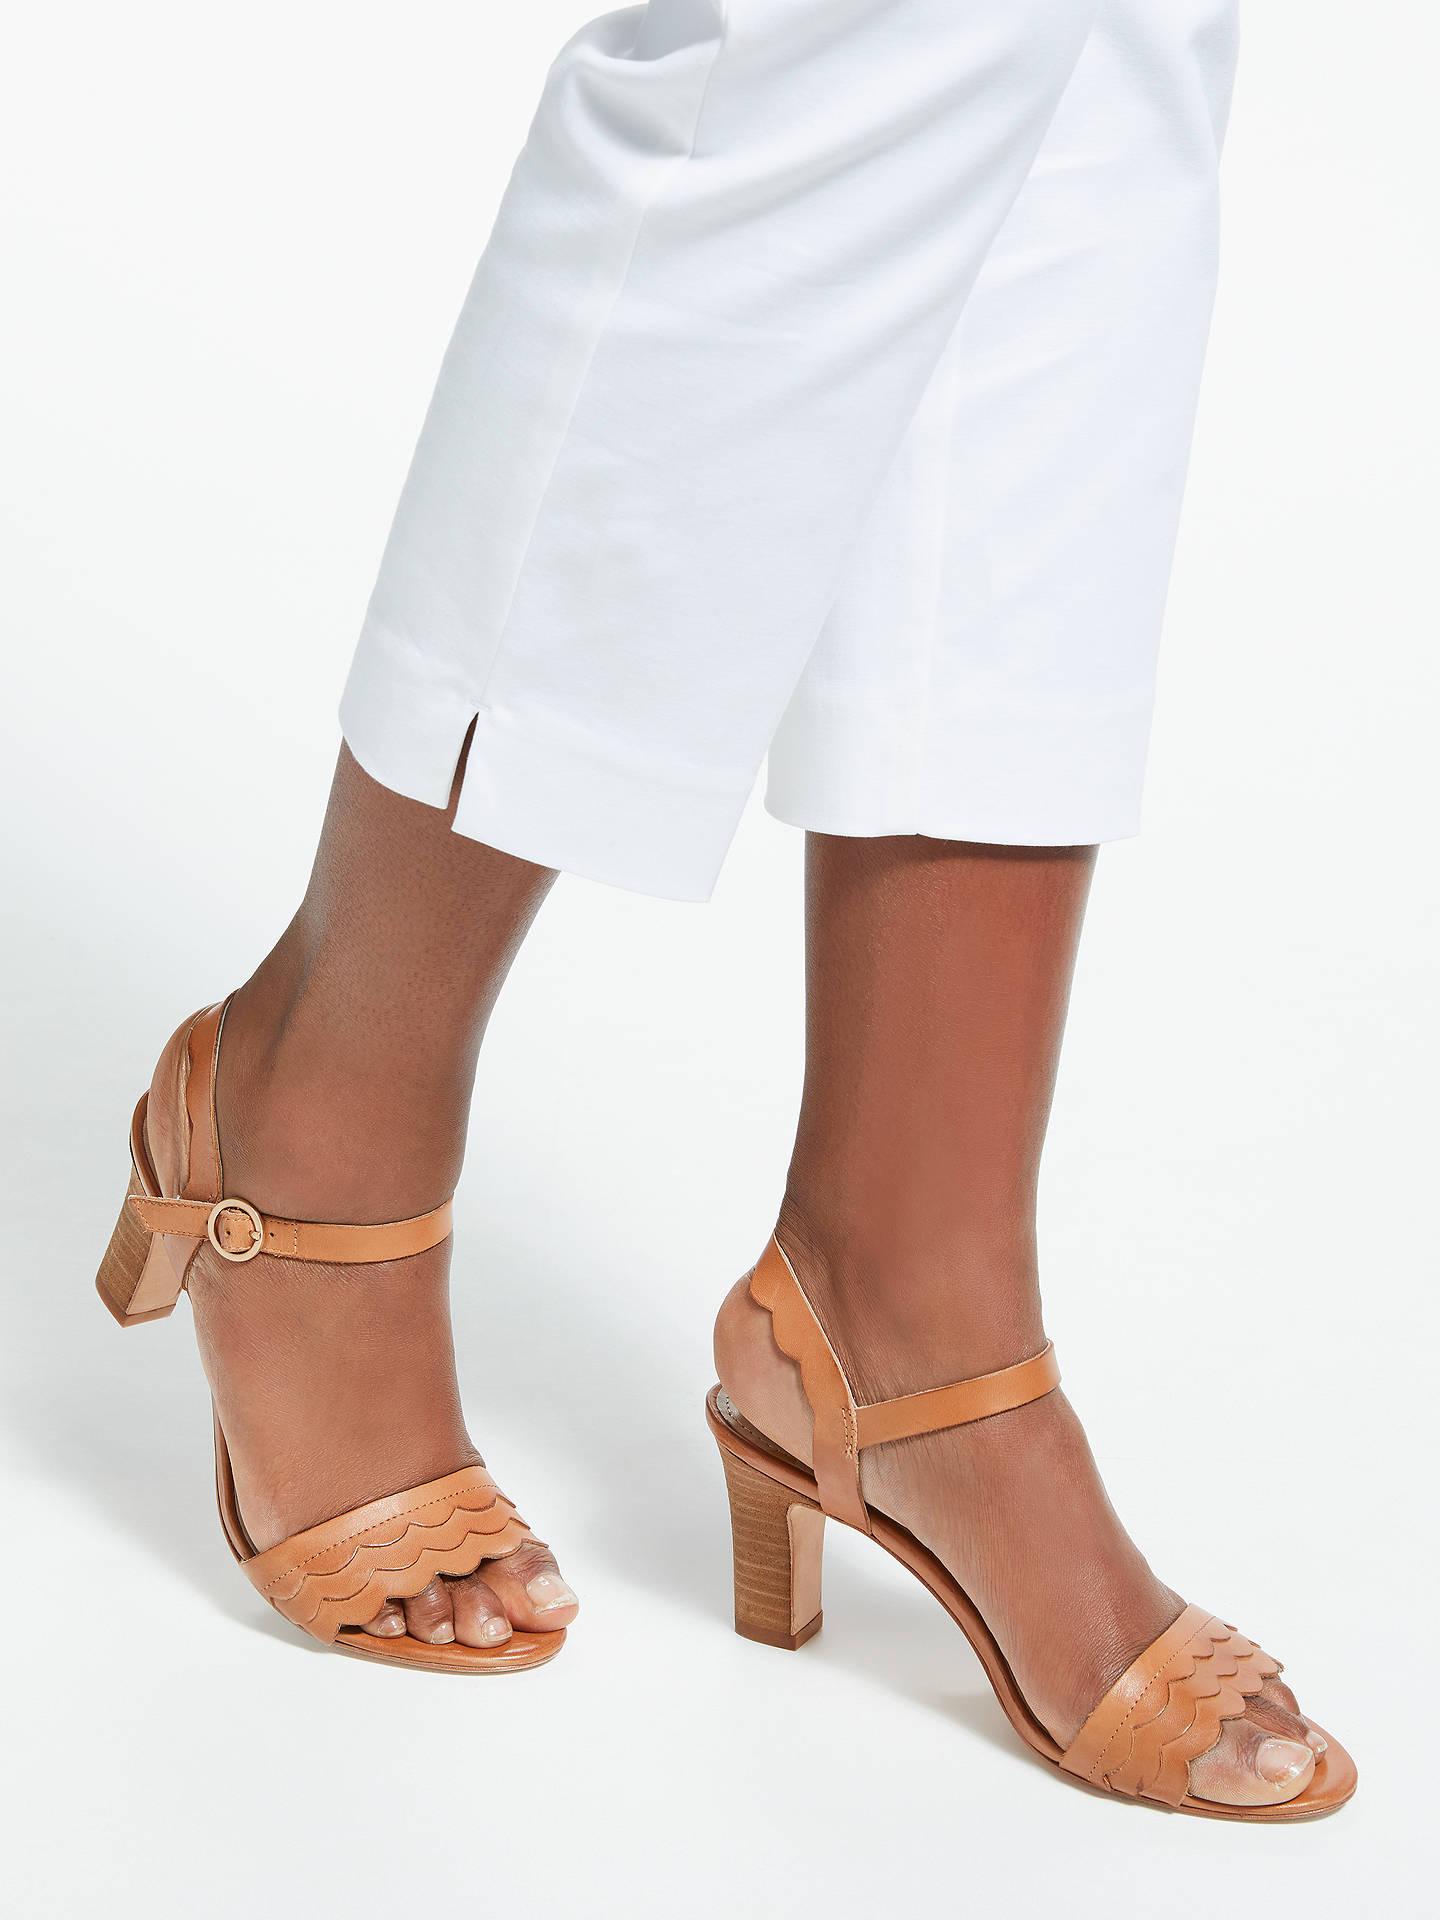 Boden Ruth Block Heel Sandals At John Lewis Amp Partners